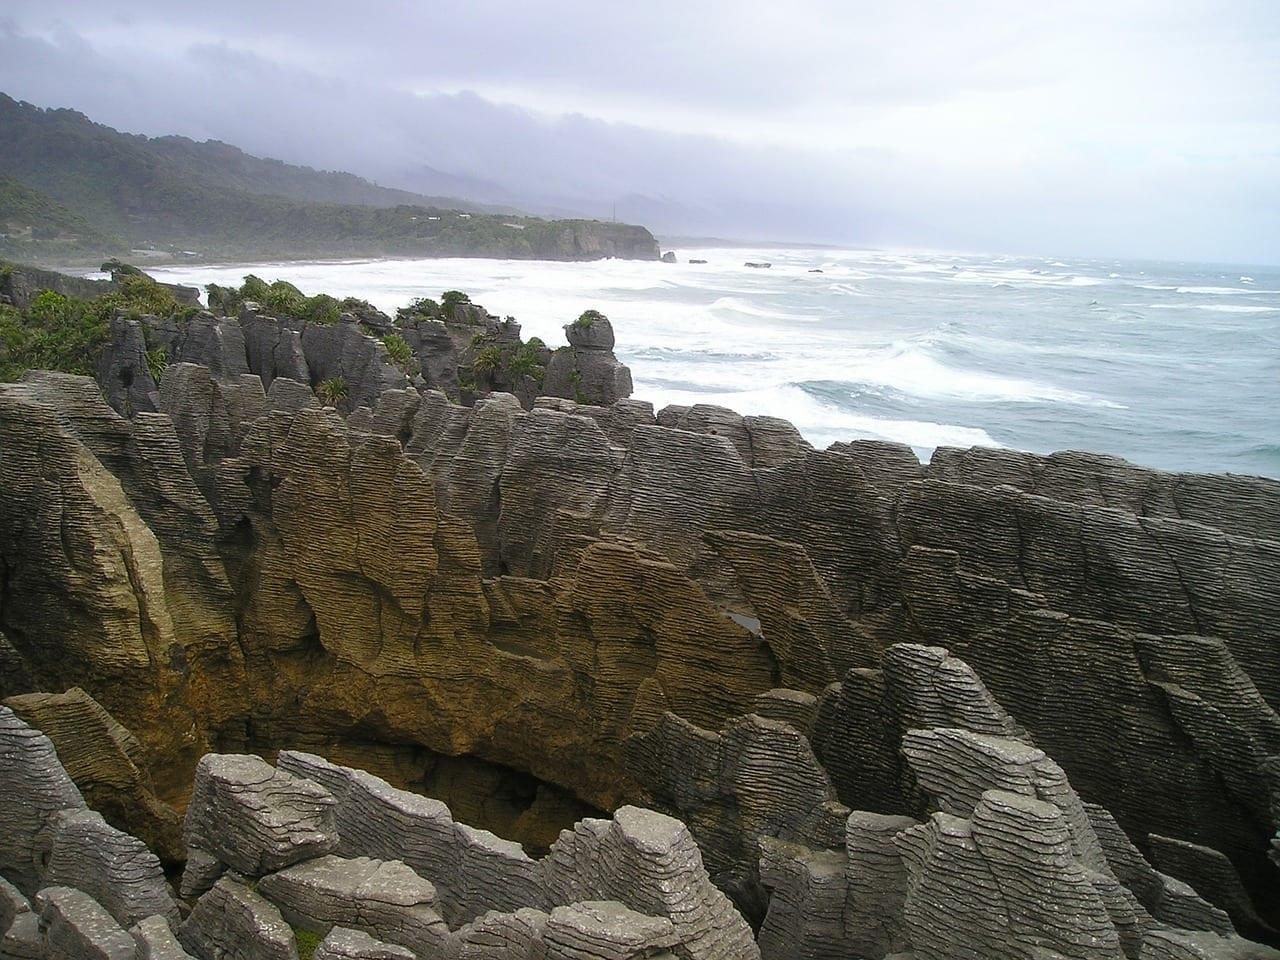 Crepe Piedras Punakaiki Nueva Zelanda